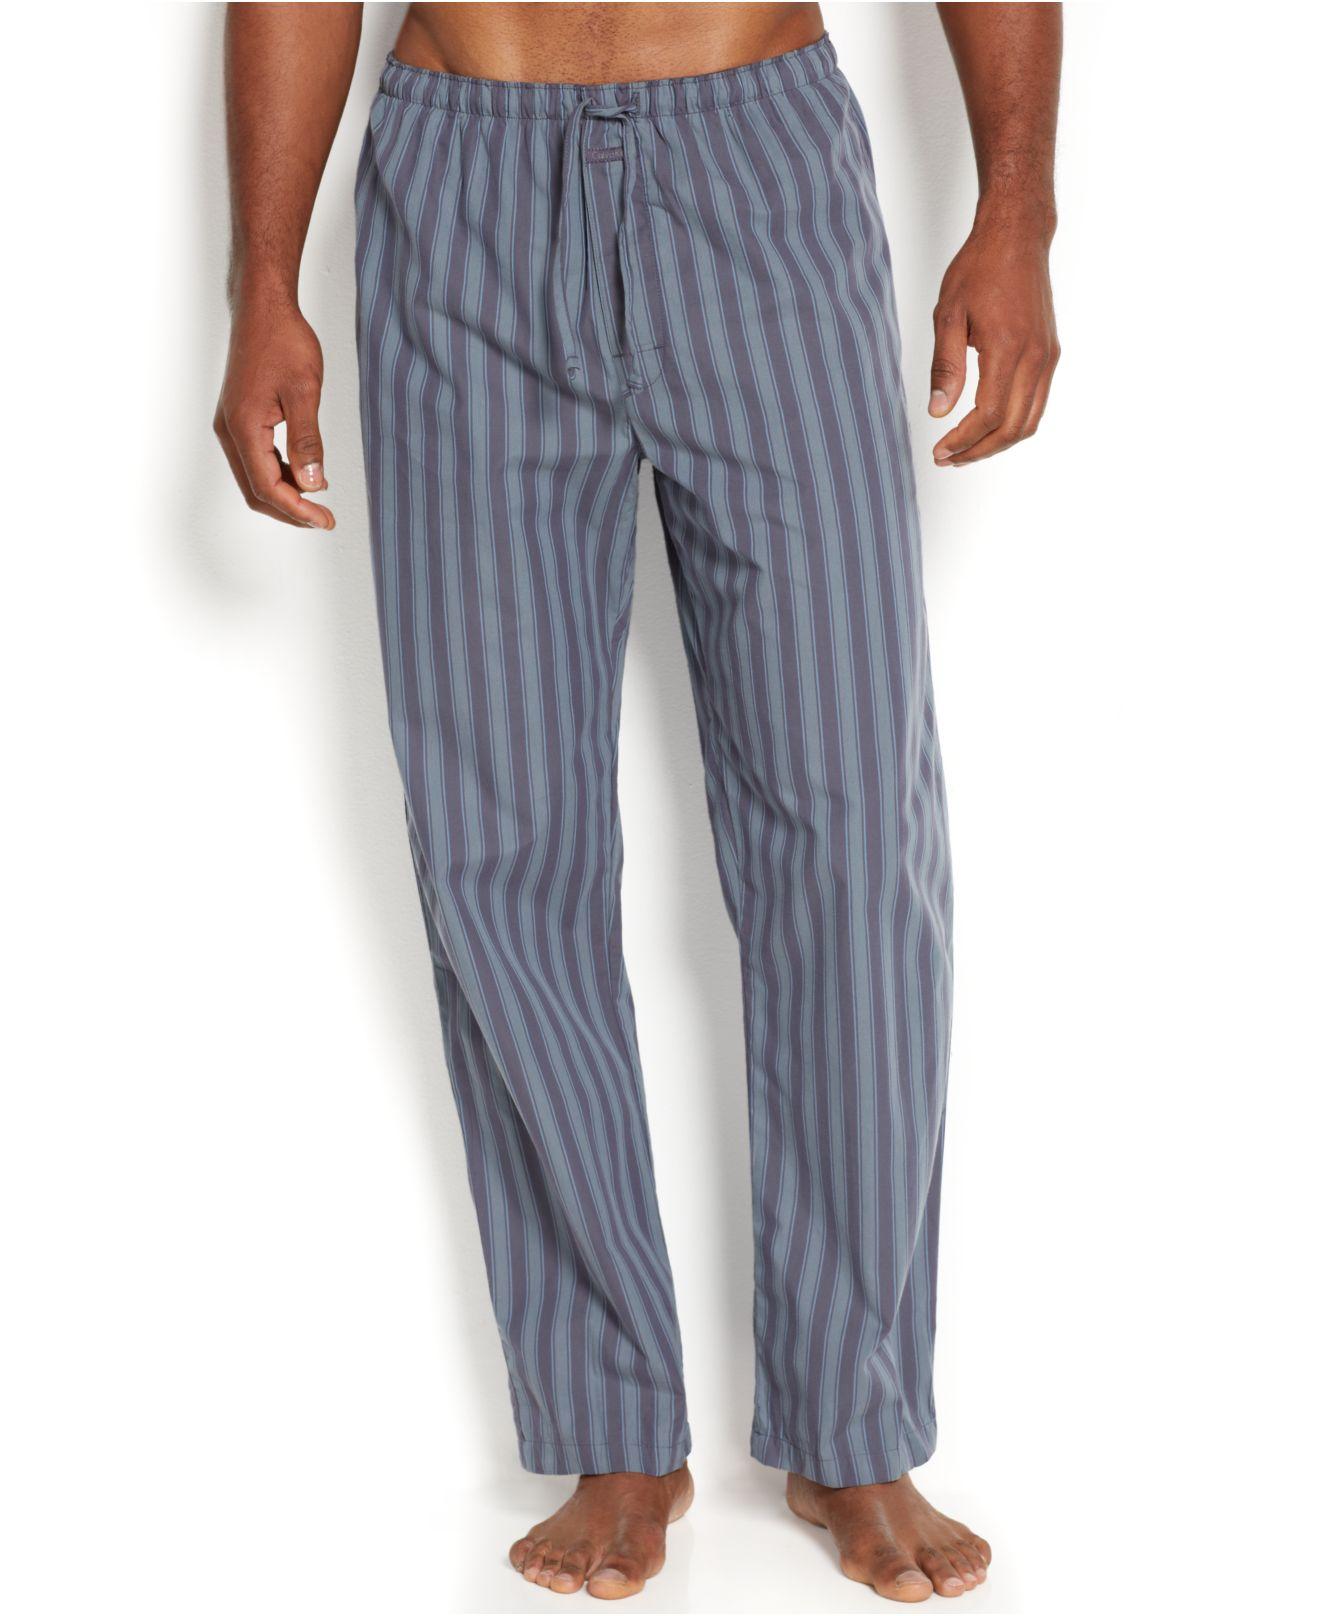 Lyst - Calvin Klein Men S Striped Pajama Pants U1726 for Men 9a0ceb45c